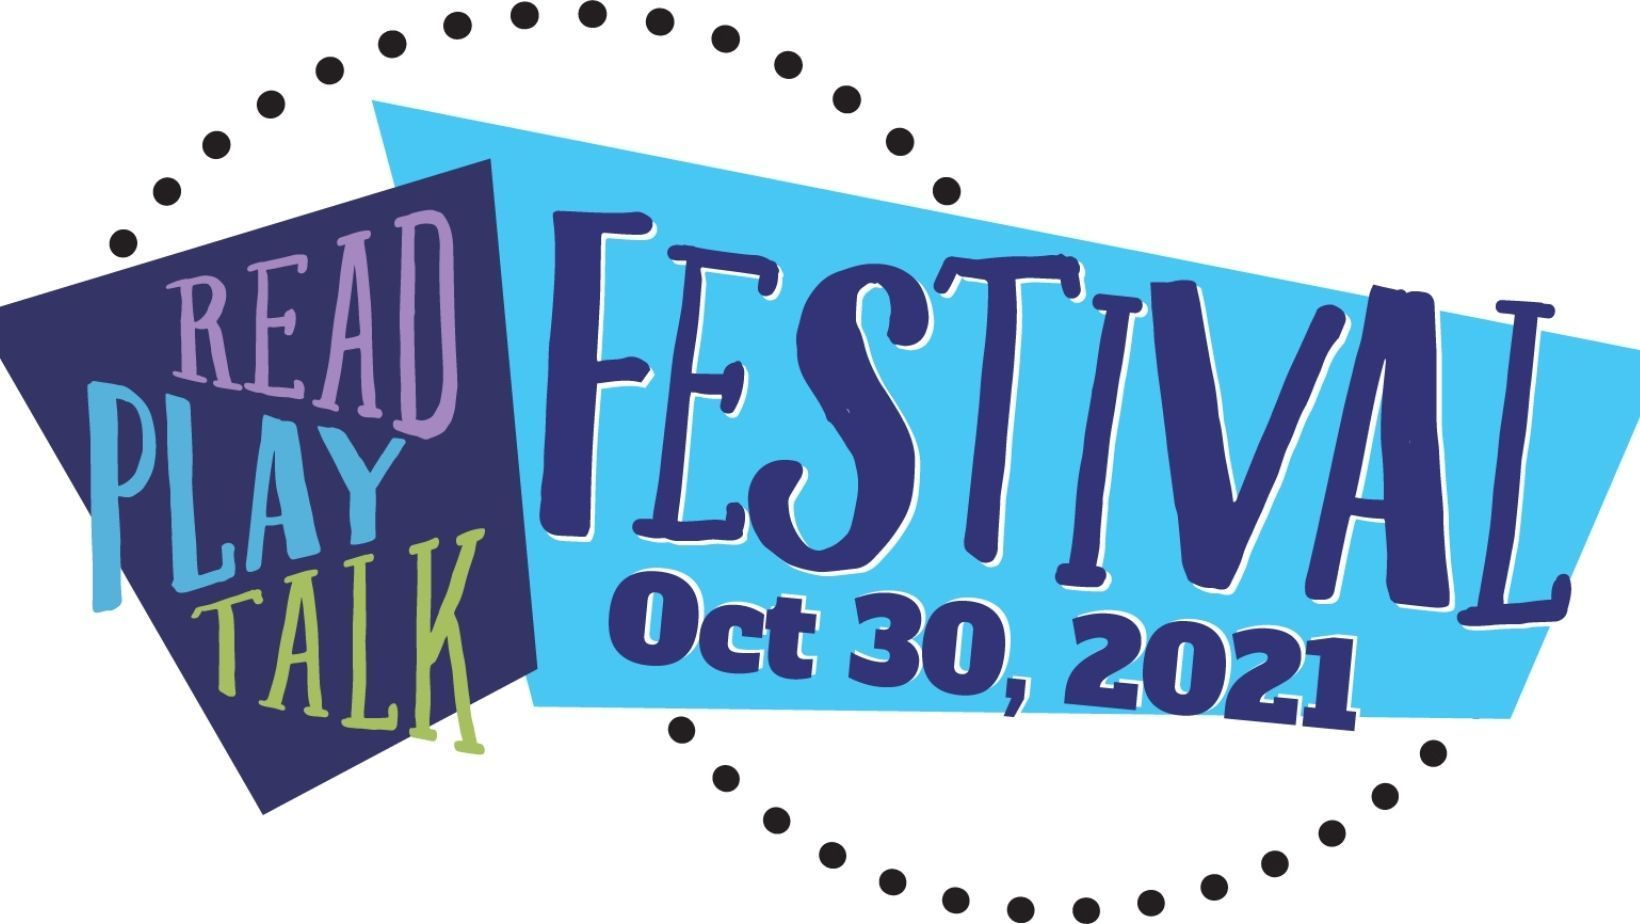 2021 Read Play Talk Festival